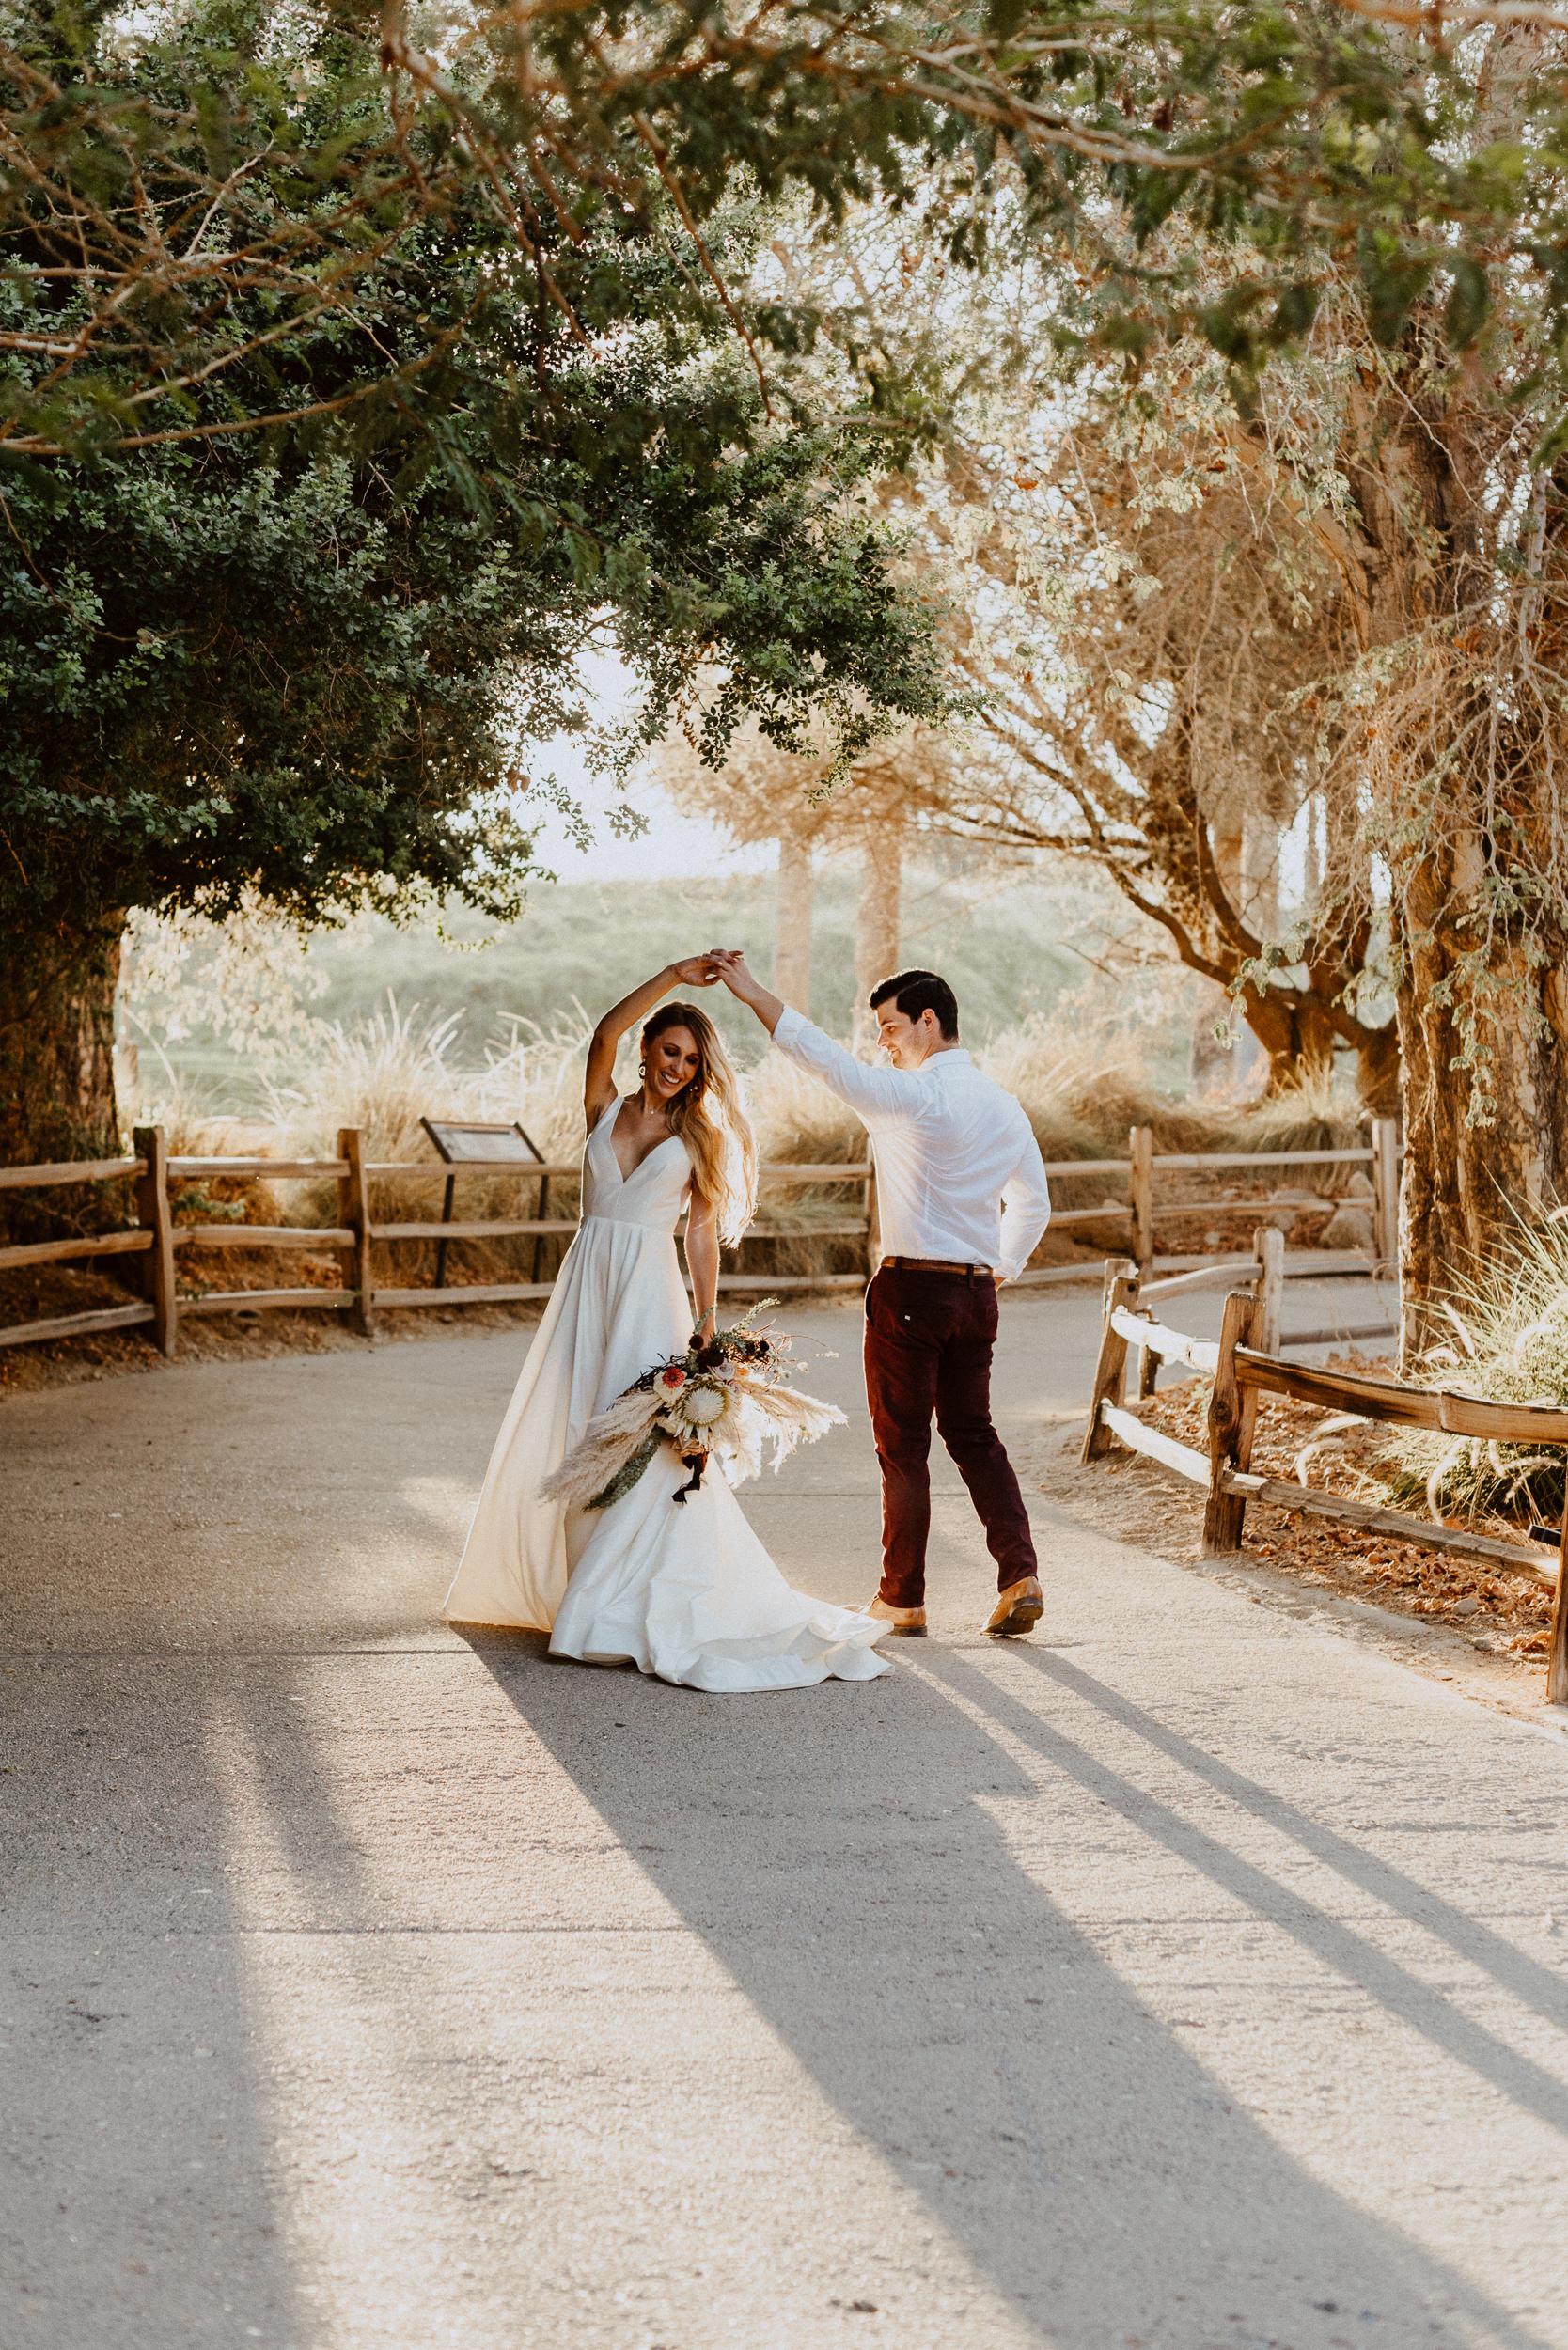 sChelsie + Chris - The Desert Shootout Wedding Romantics at The Living Desert-139.jpg